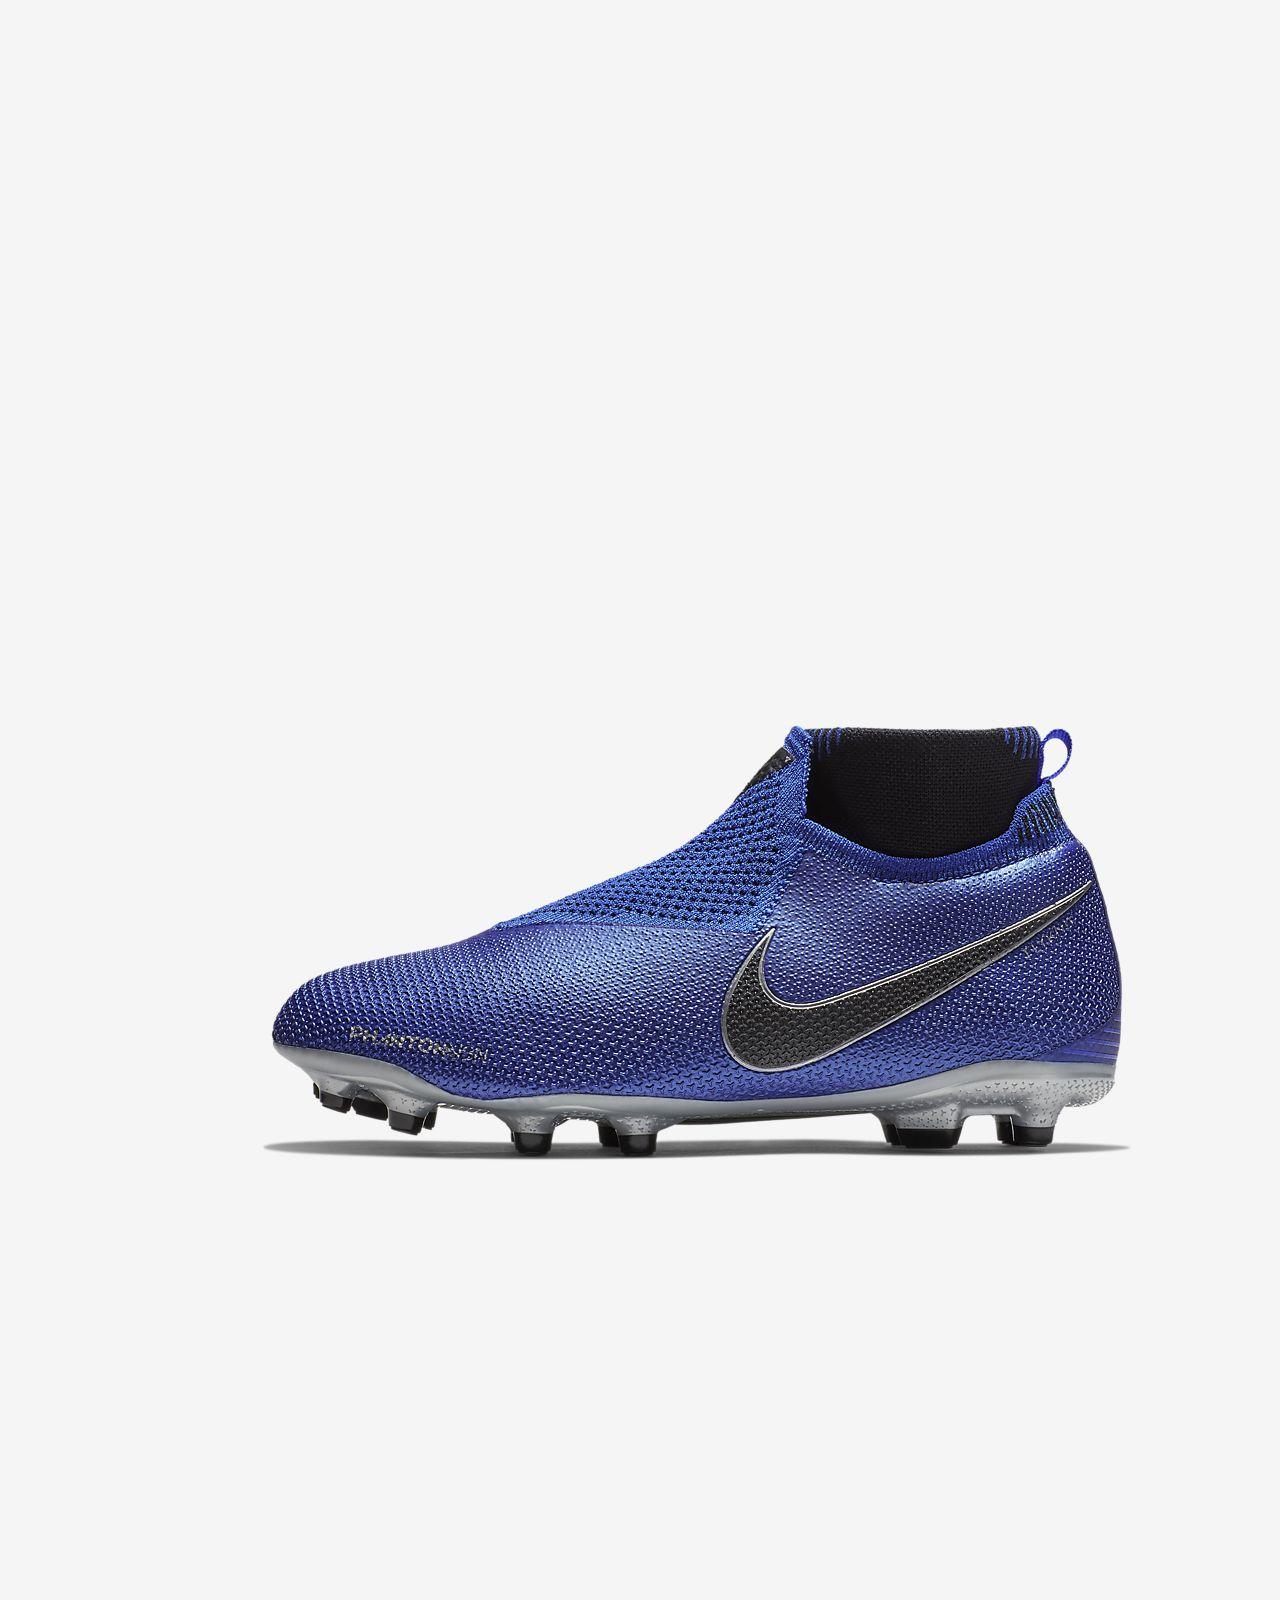 83f52f0b0 Older Kids  Multi-Ground Football Boot. Nike Jr. Phantom Vision Elite  Dynamic Fit Game Over MG